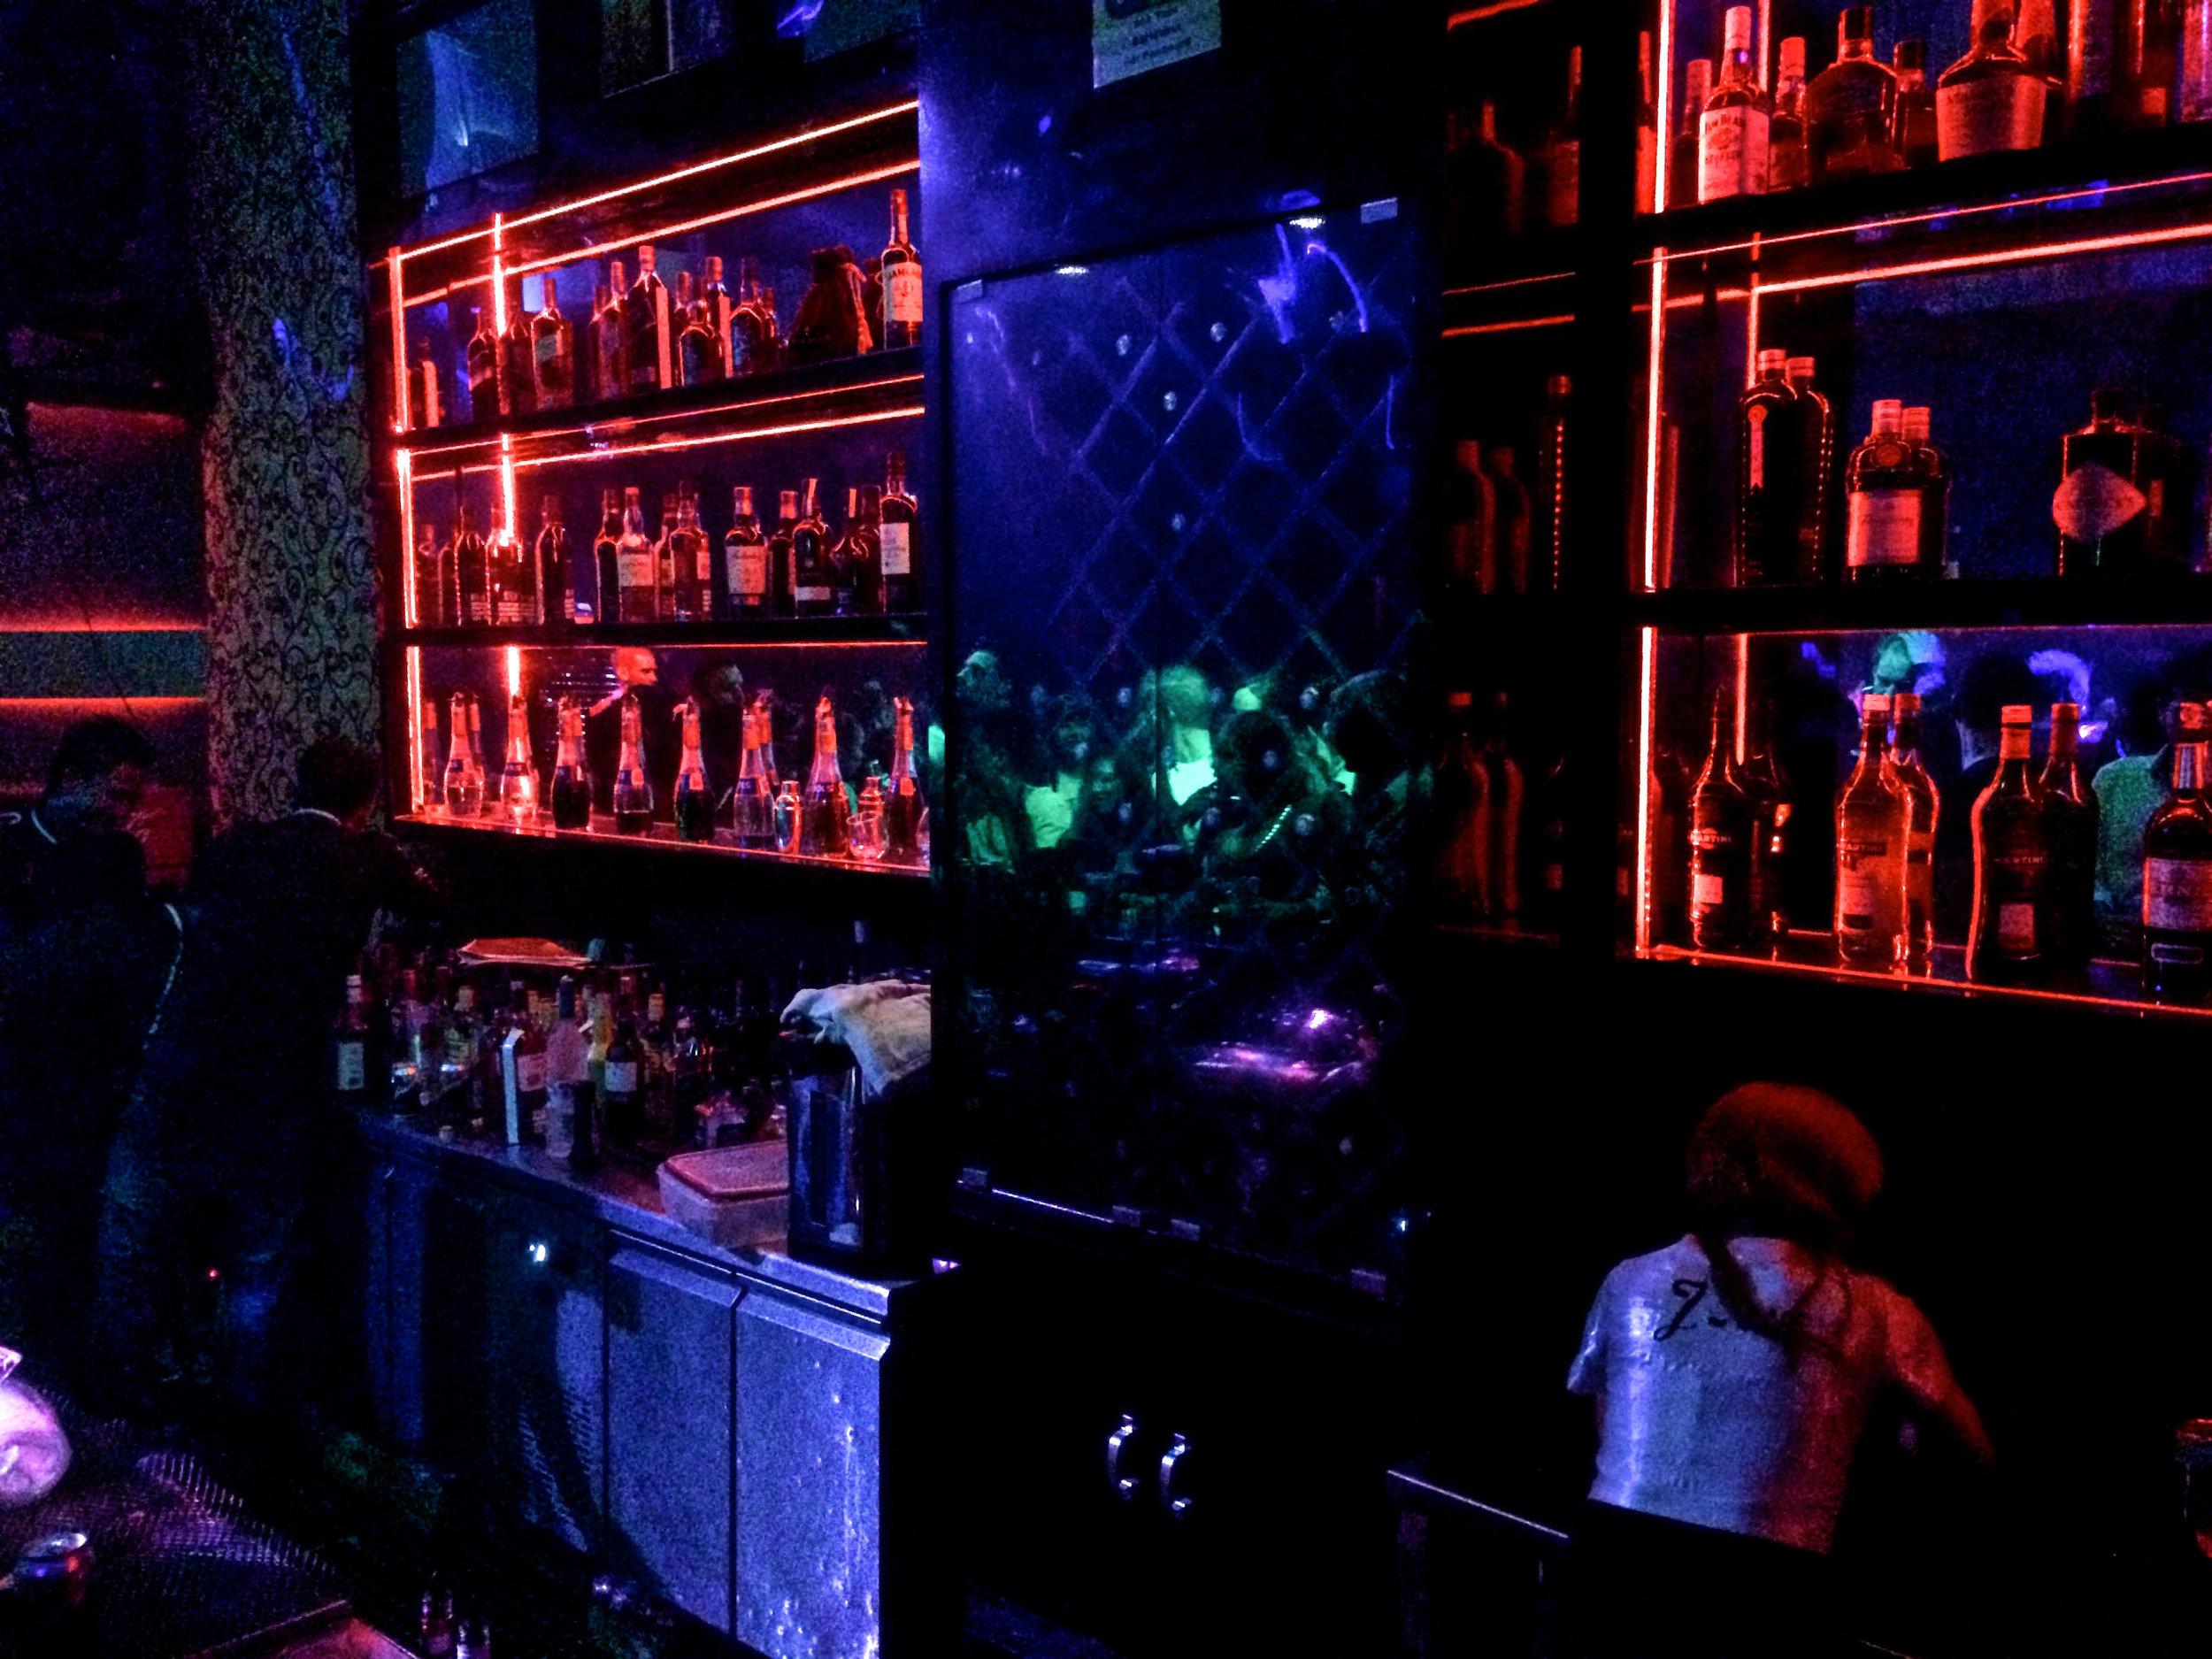 J-1 Bar nightlife rangoon yangon burma myanmar 3-2.jpg